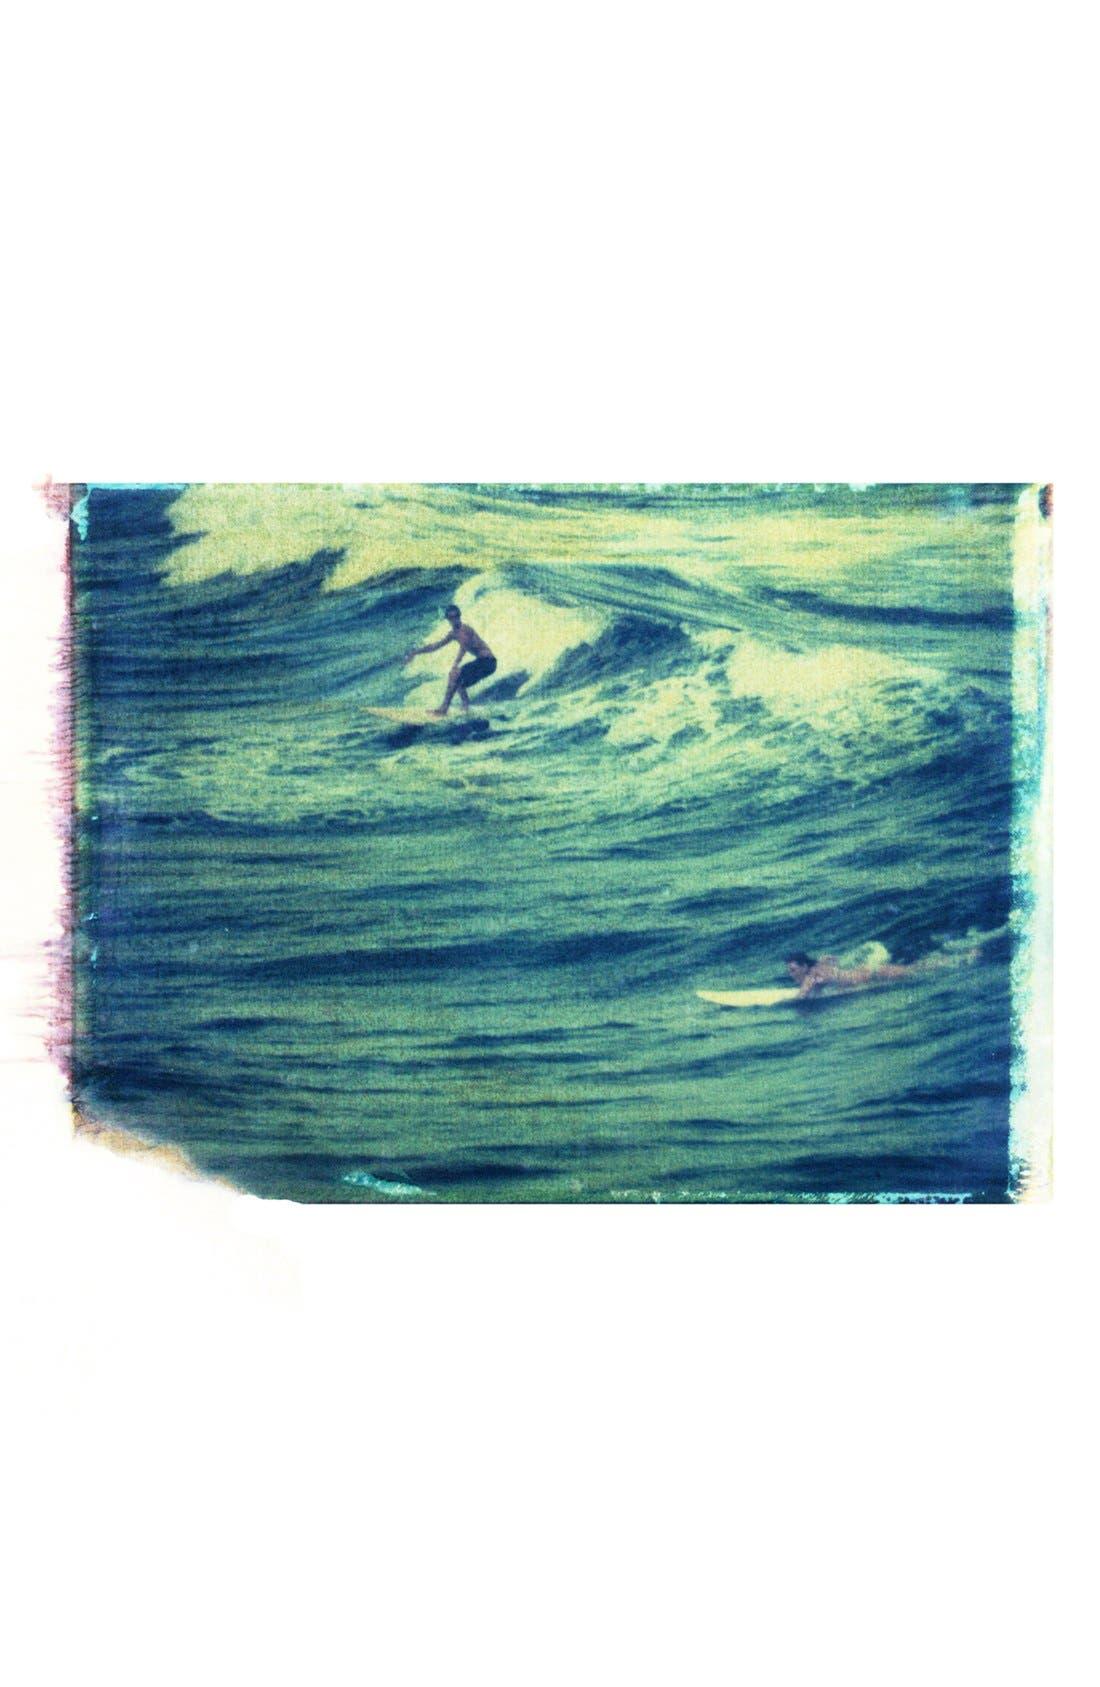 Main Image - She Hit Pause Studios 'Surfers' Wall Art